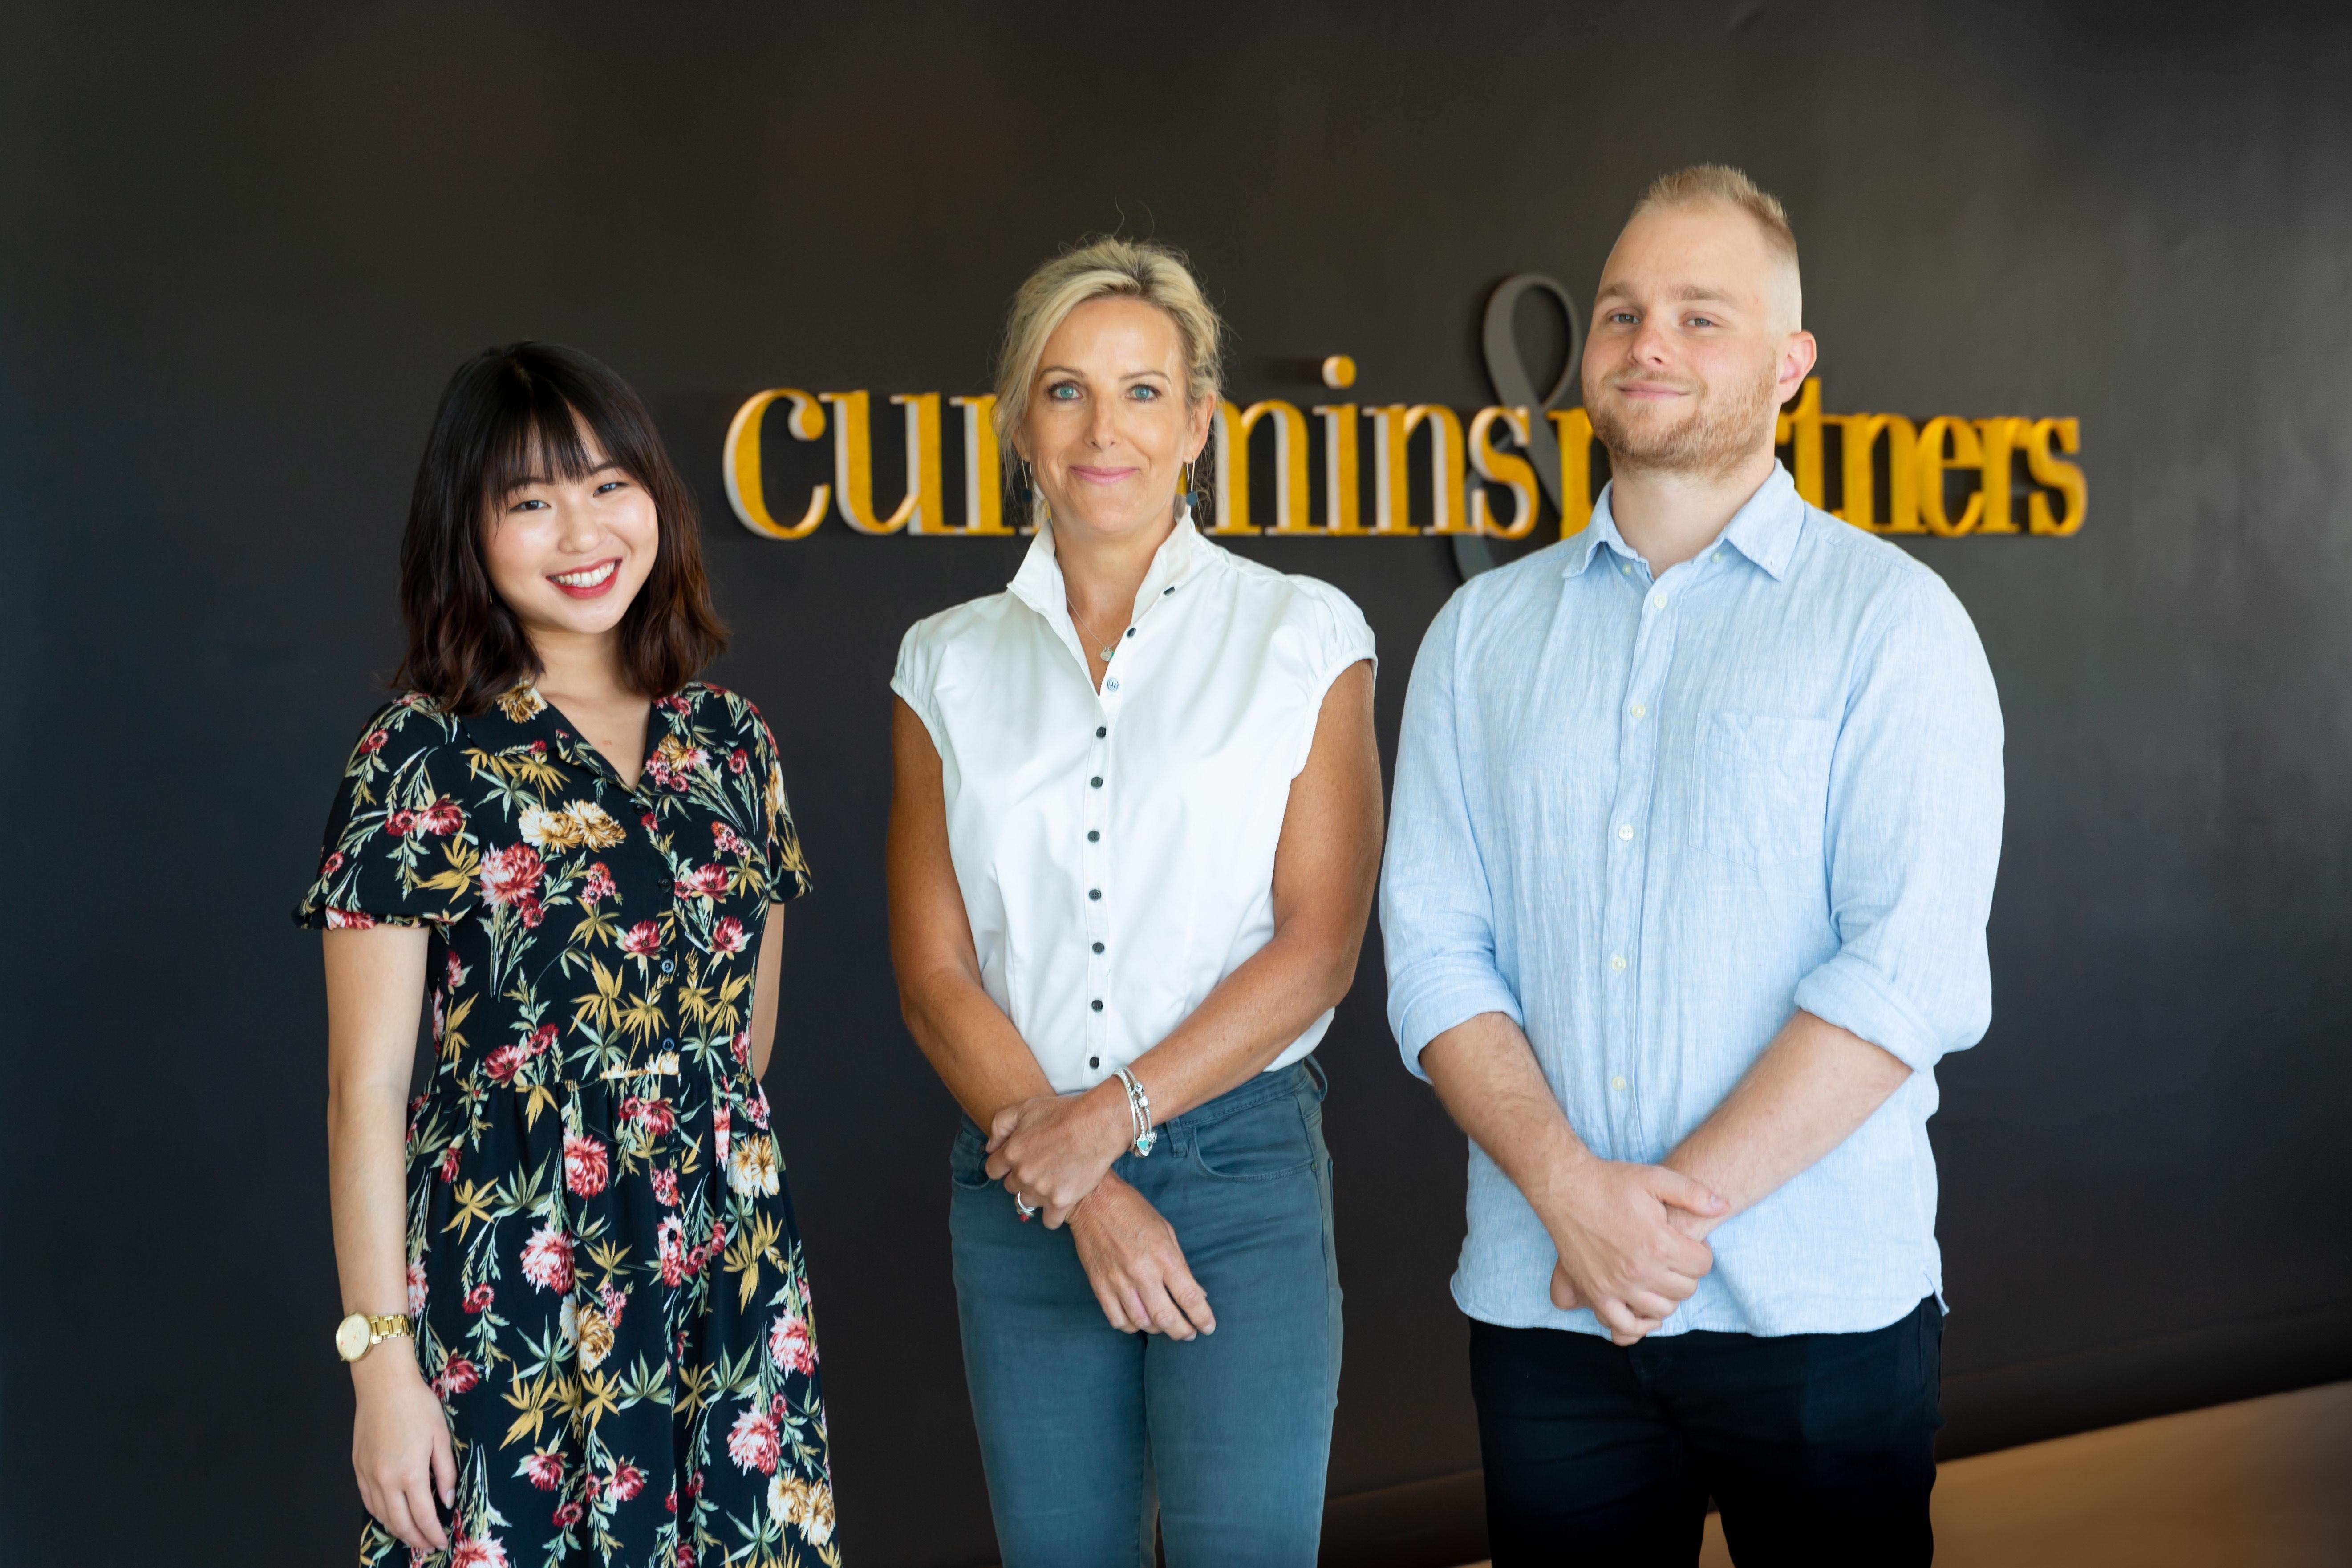 Cummins&Partners Boosts Media Leadership With Lisa Mier